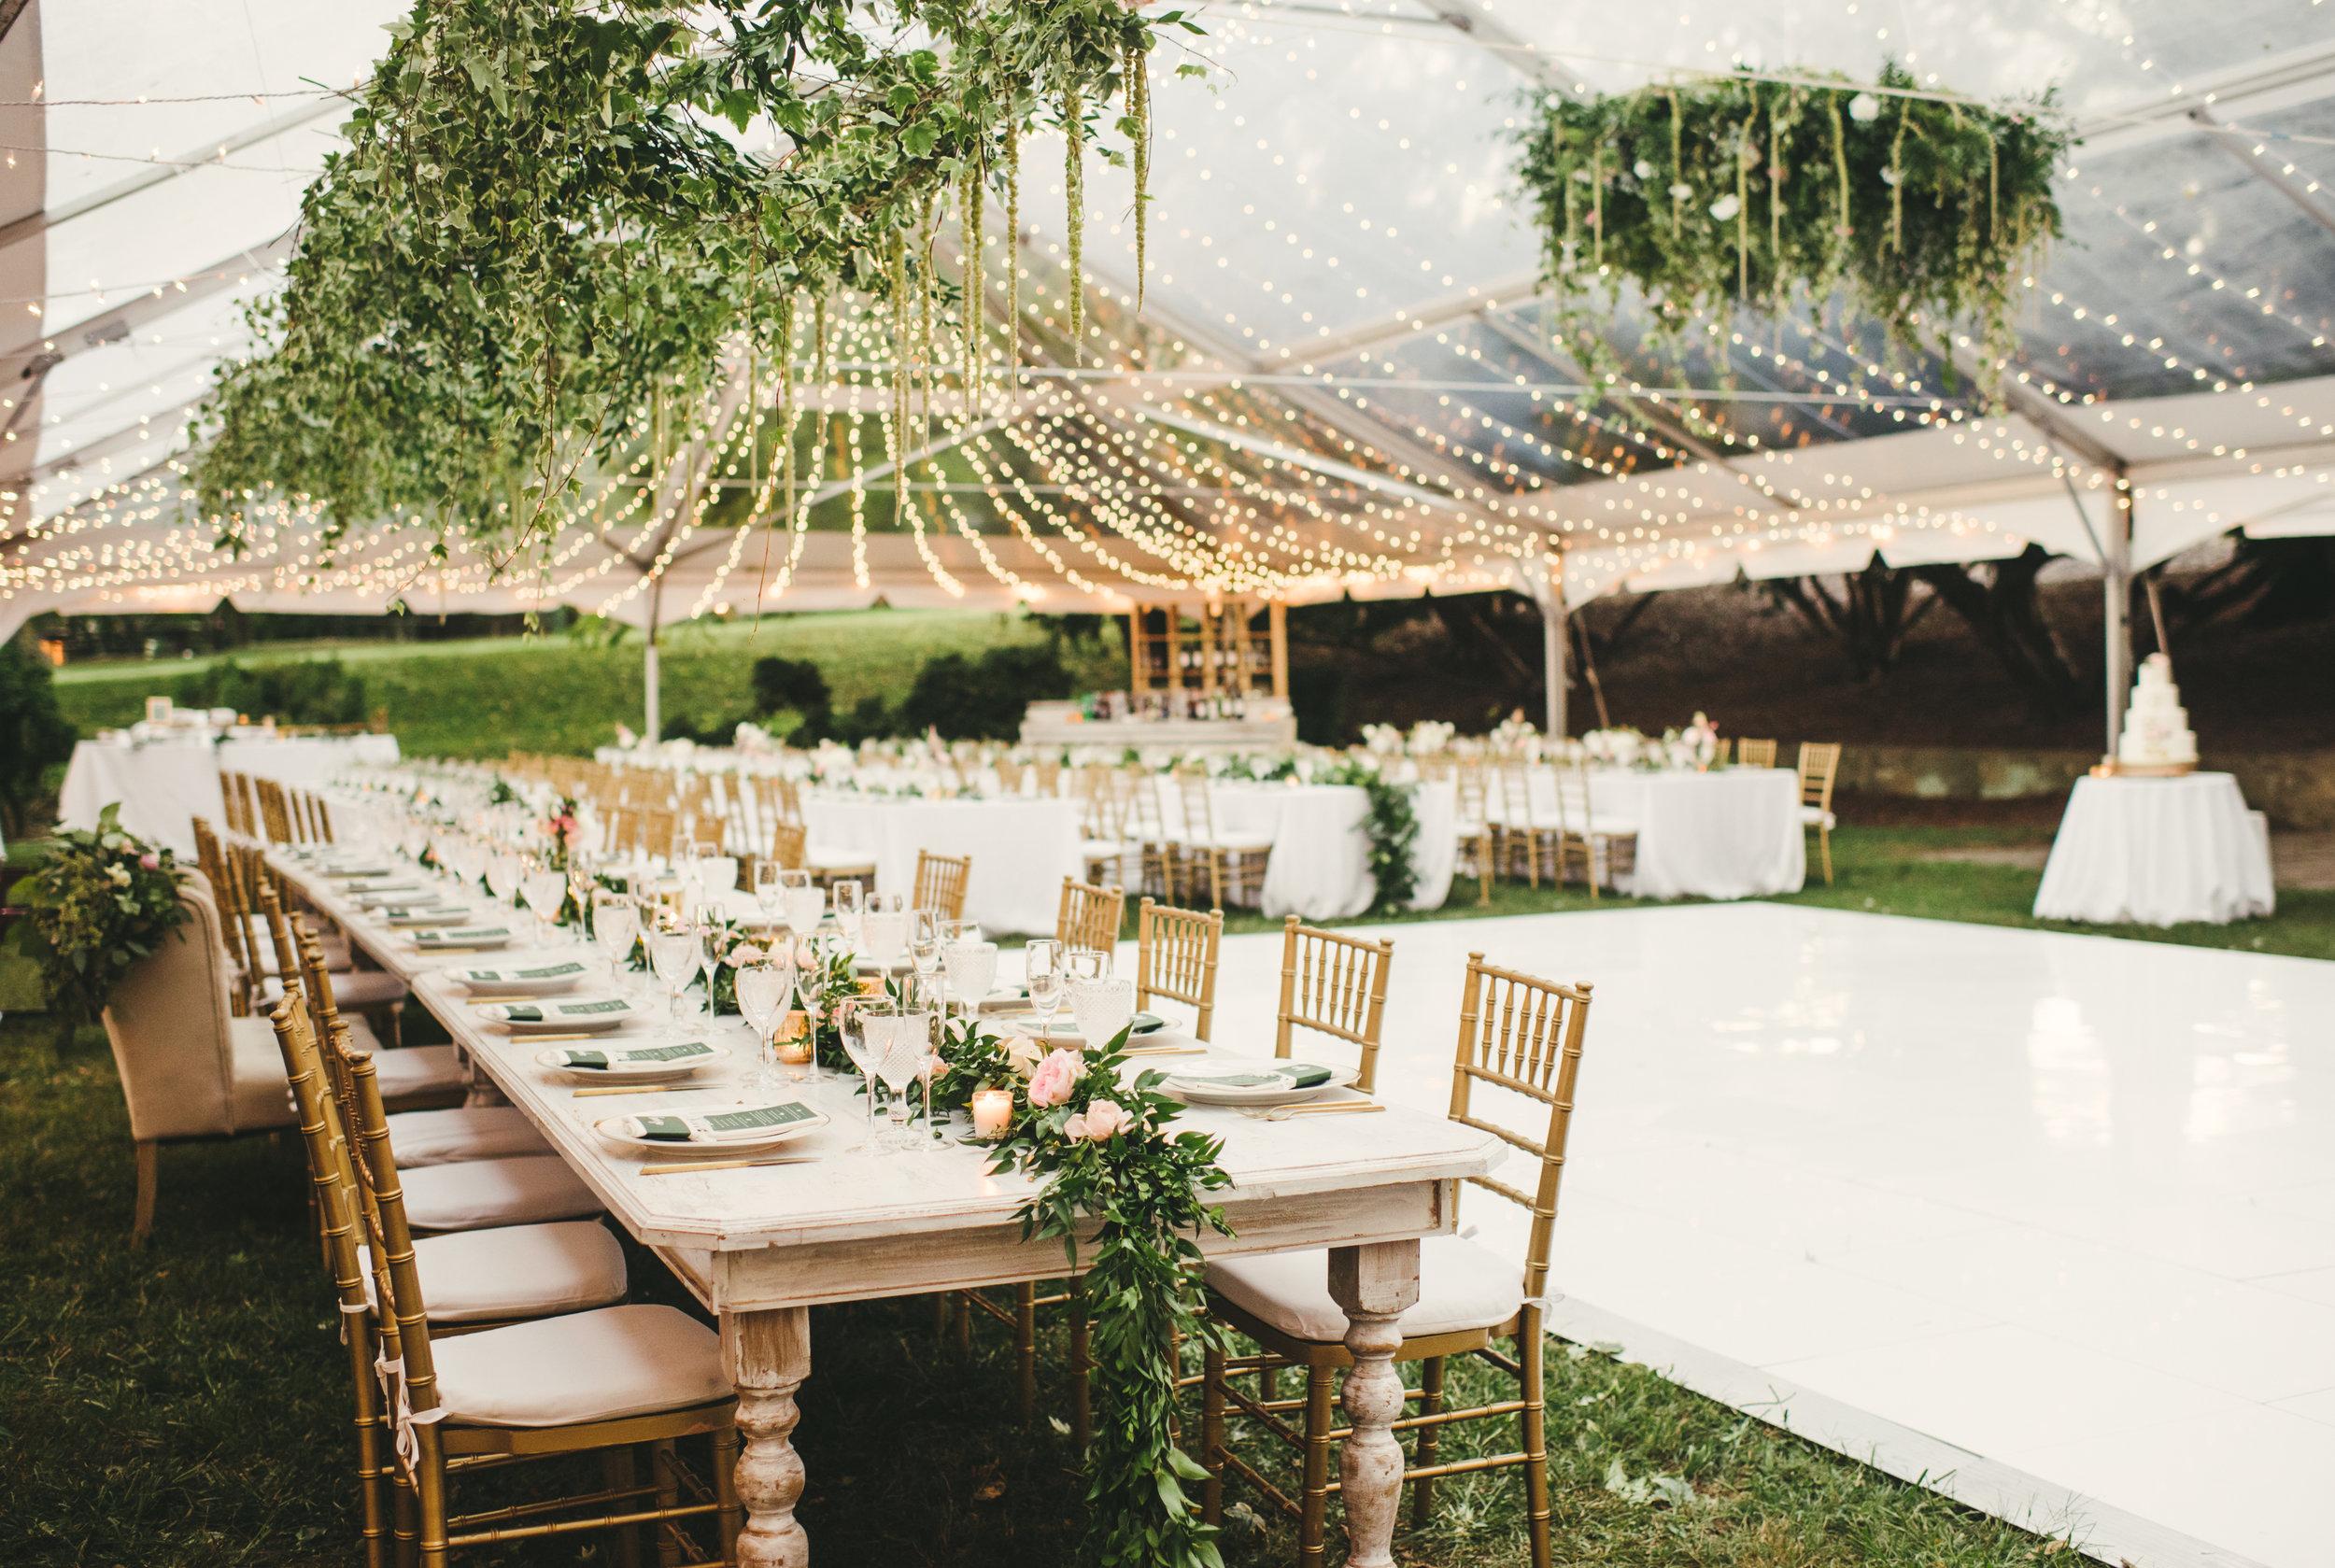 GLENVIEW MANSION WEDDING - INTIMATE WEDDING PHOTOGRAPHER - TWOTWENTY by CHI-CHI AGBIM-303.jpg